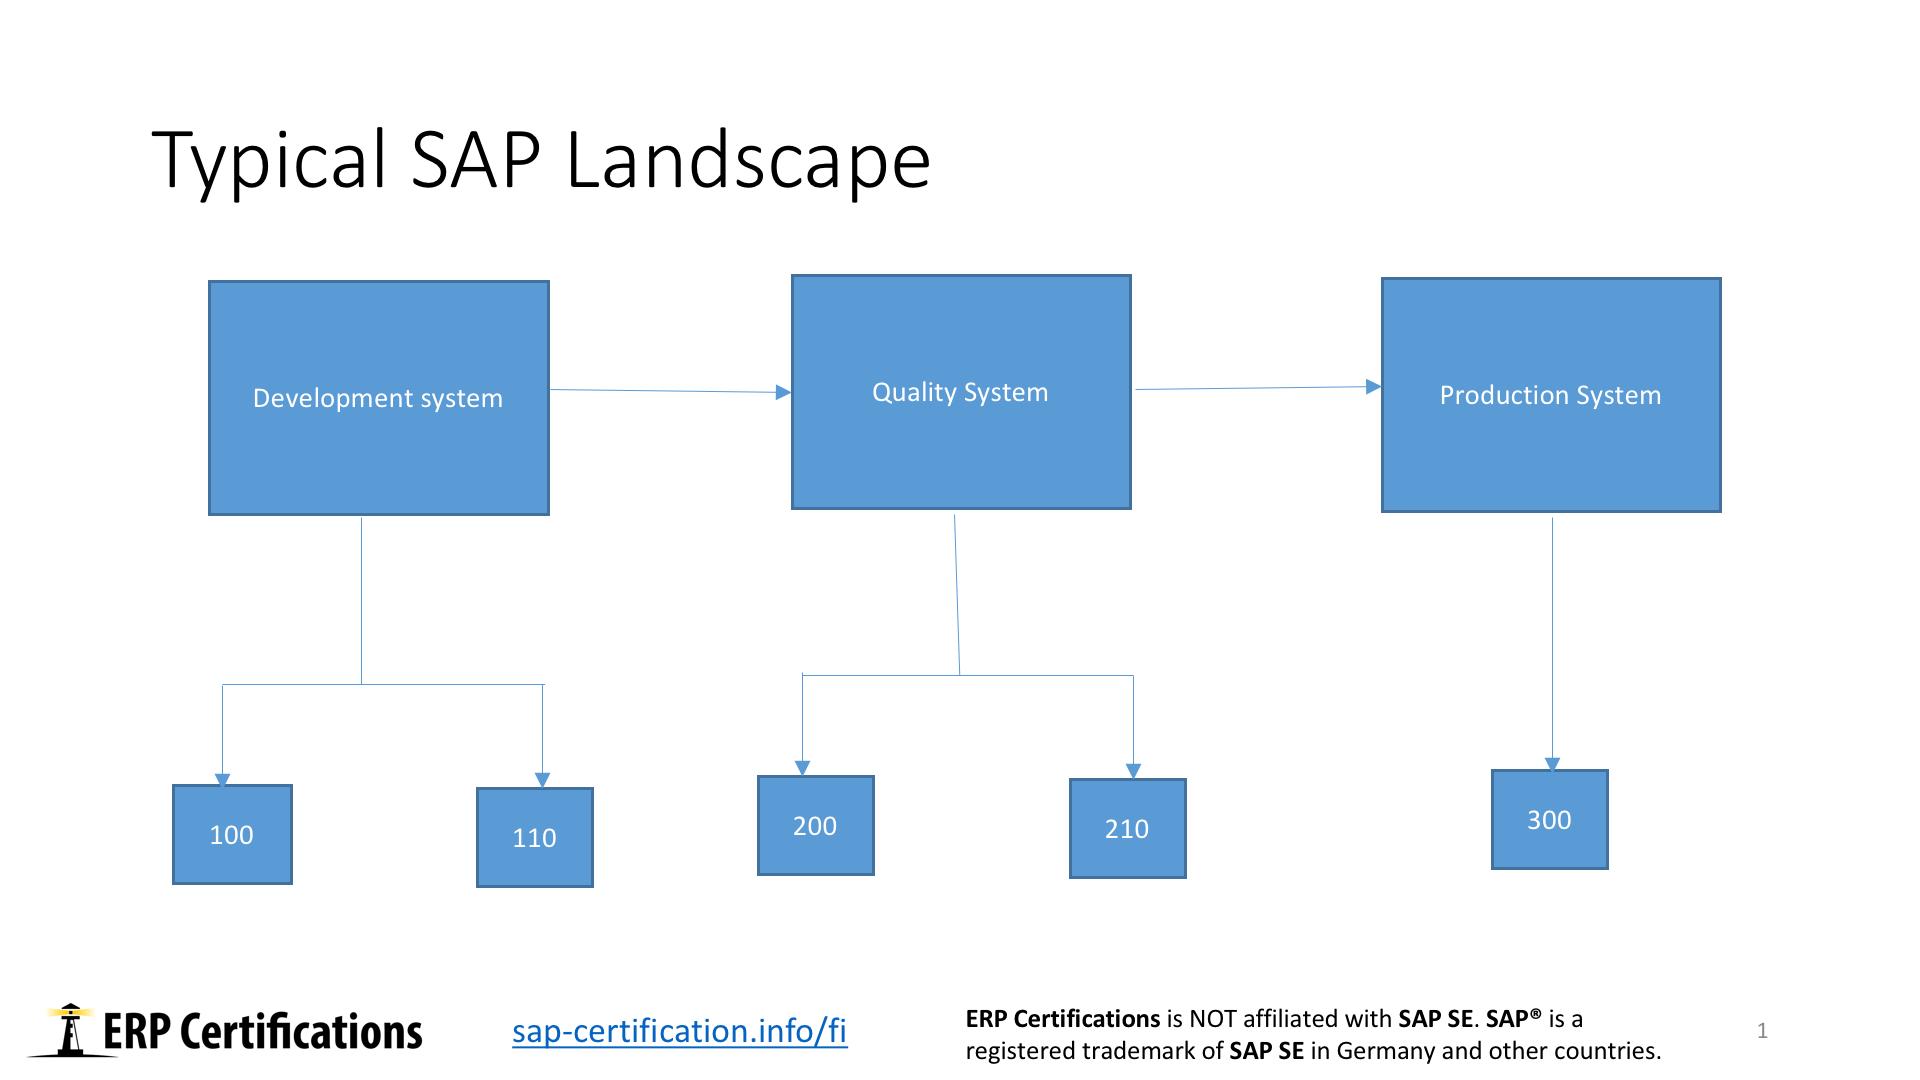 sap r 3 modules diagram vivint thermostat wiring fi organizational structure free training